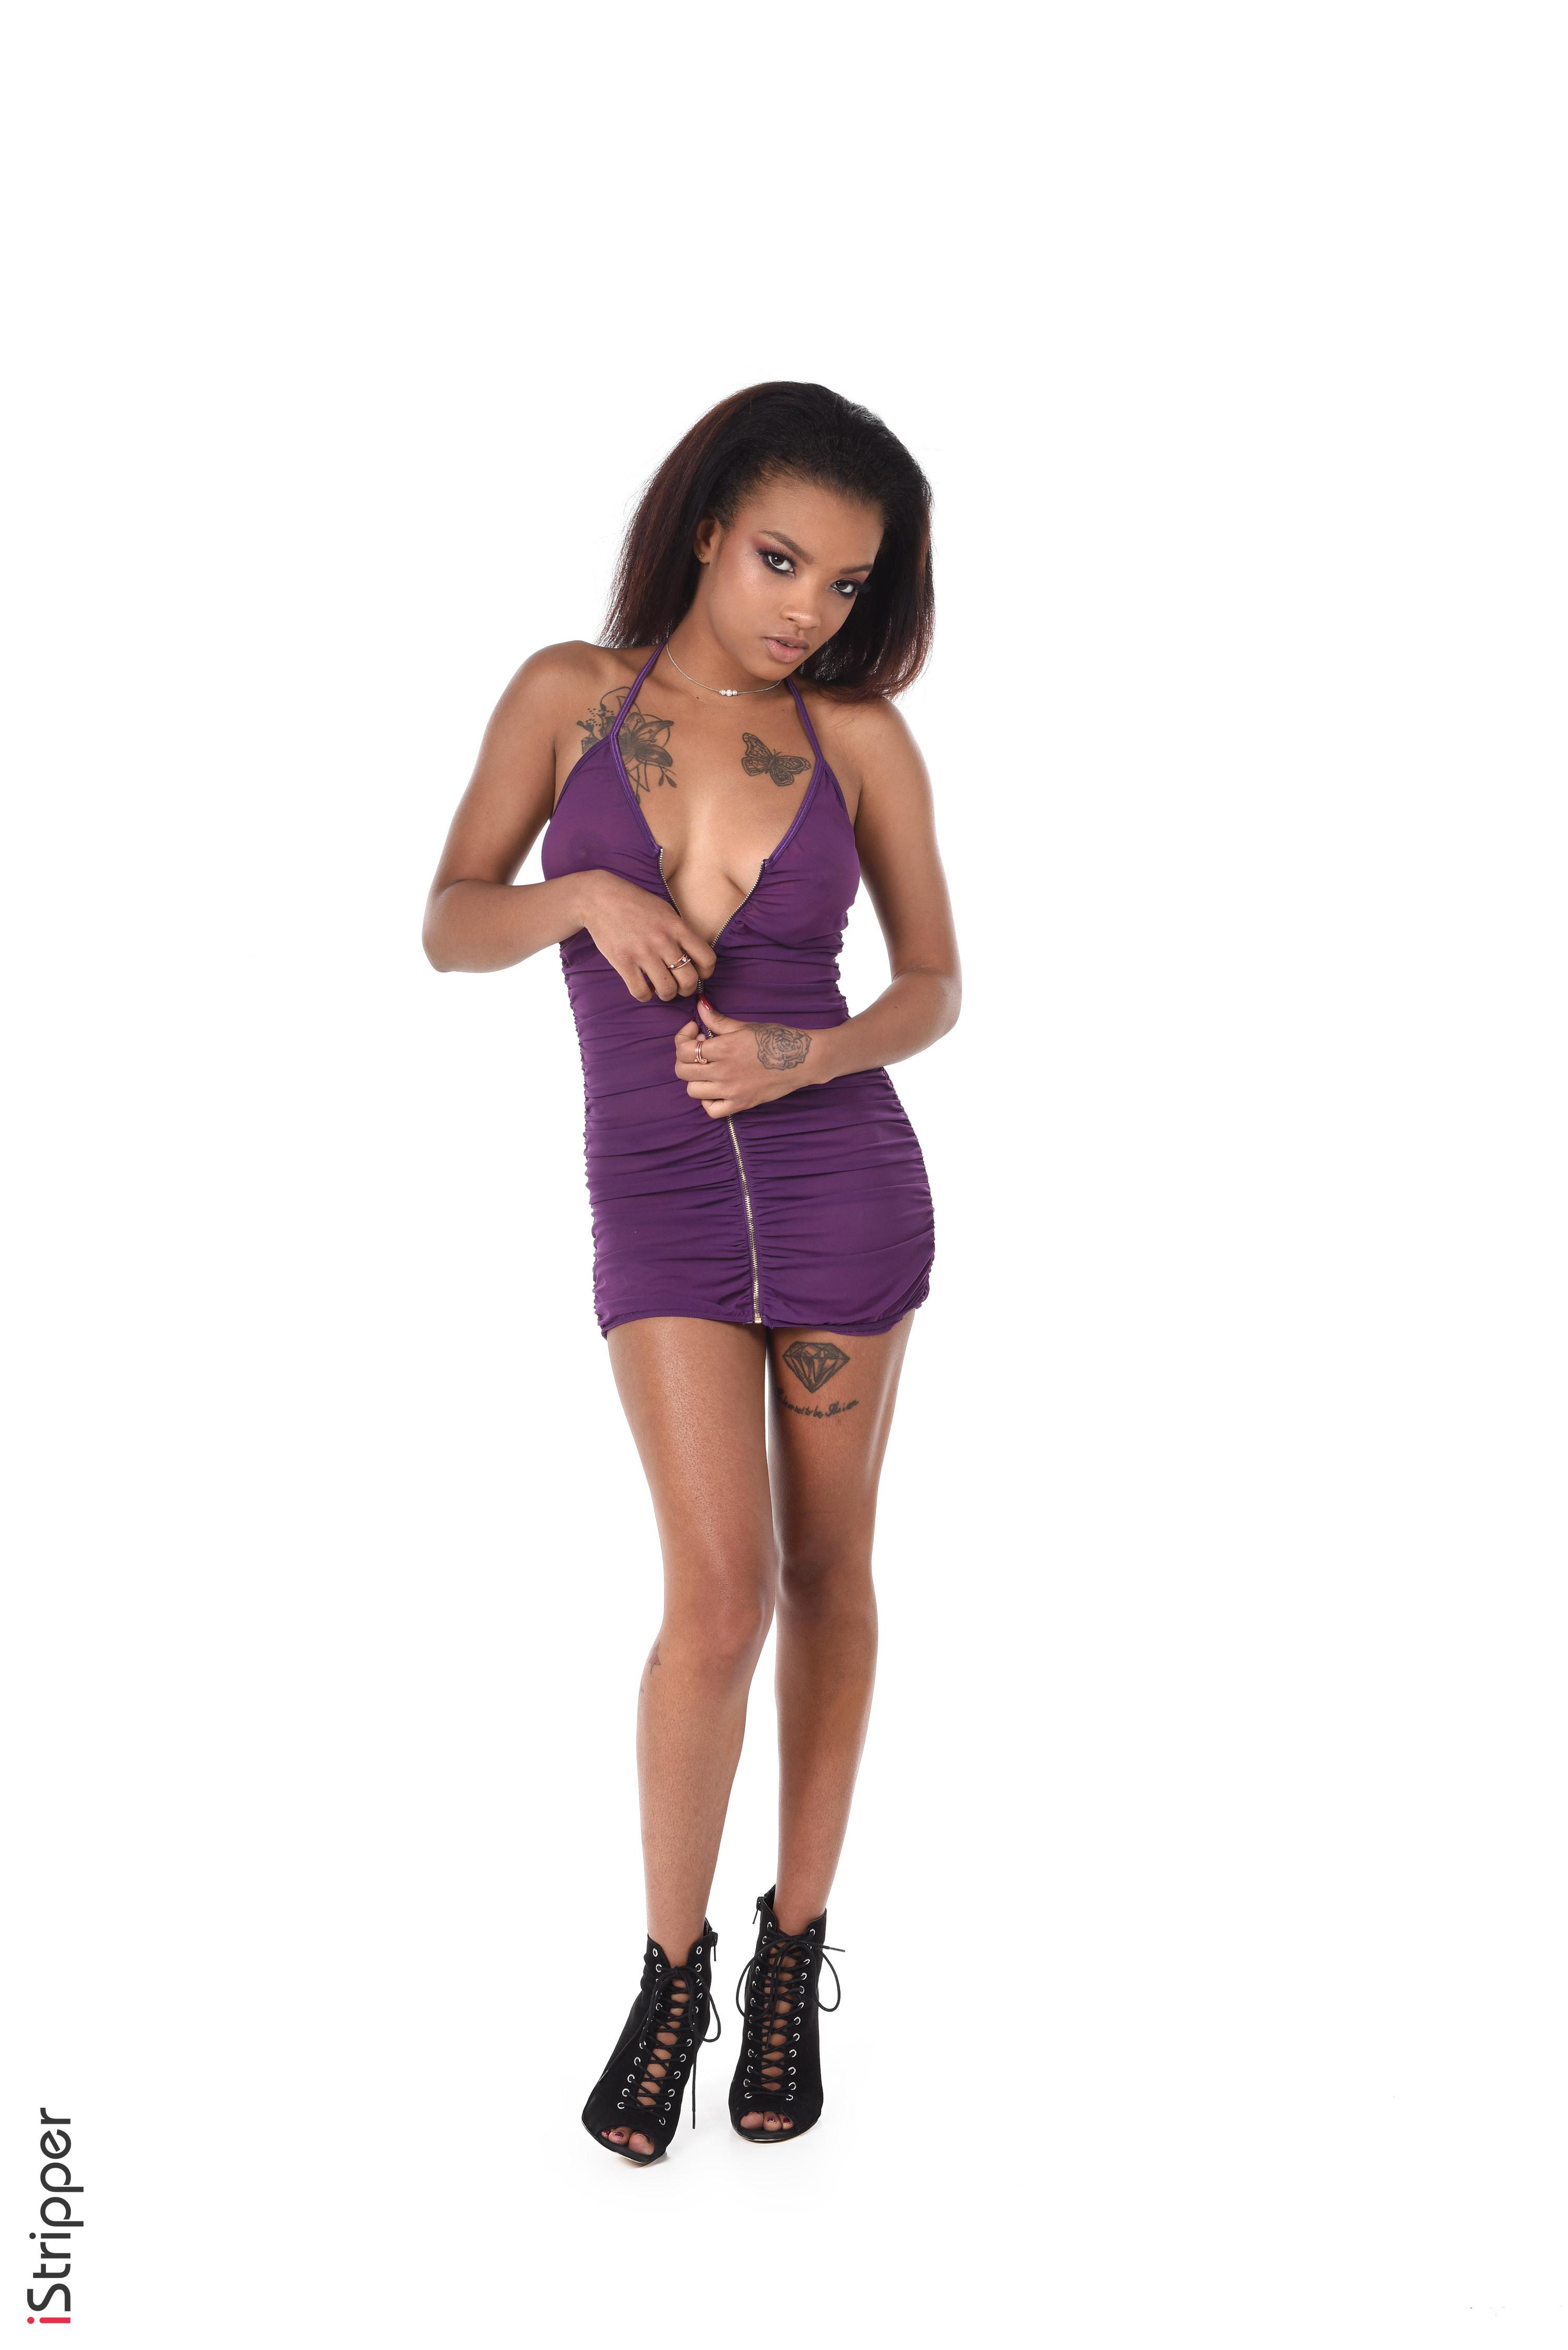 sexy amatuer striptease gif